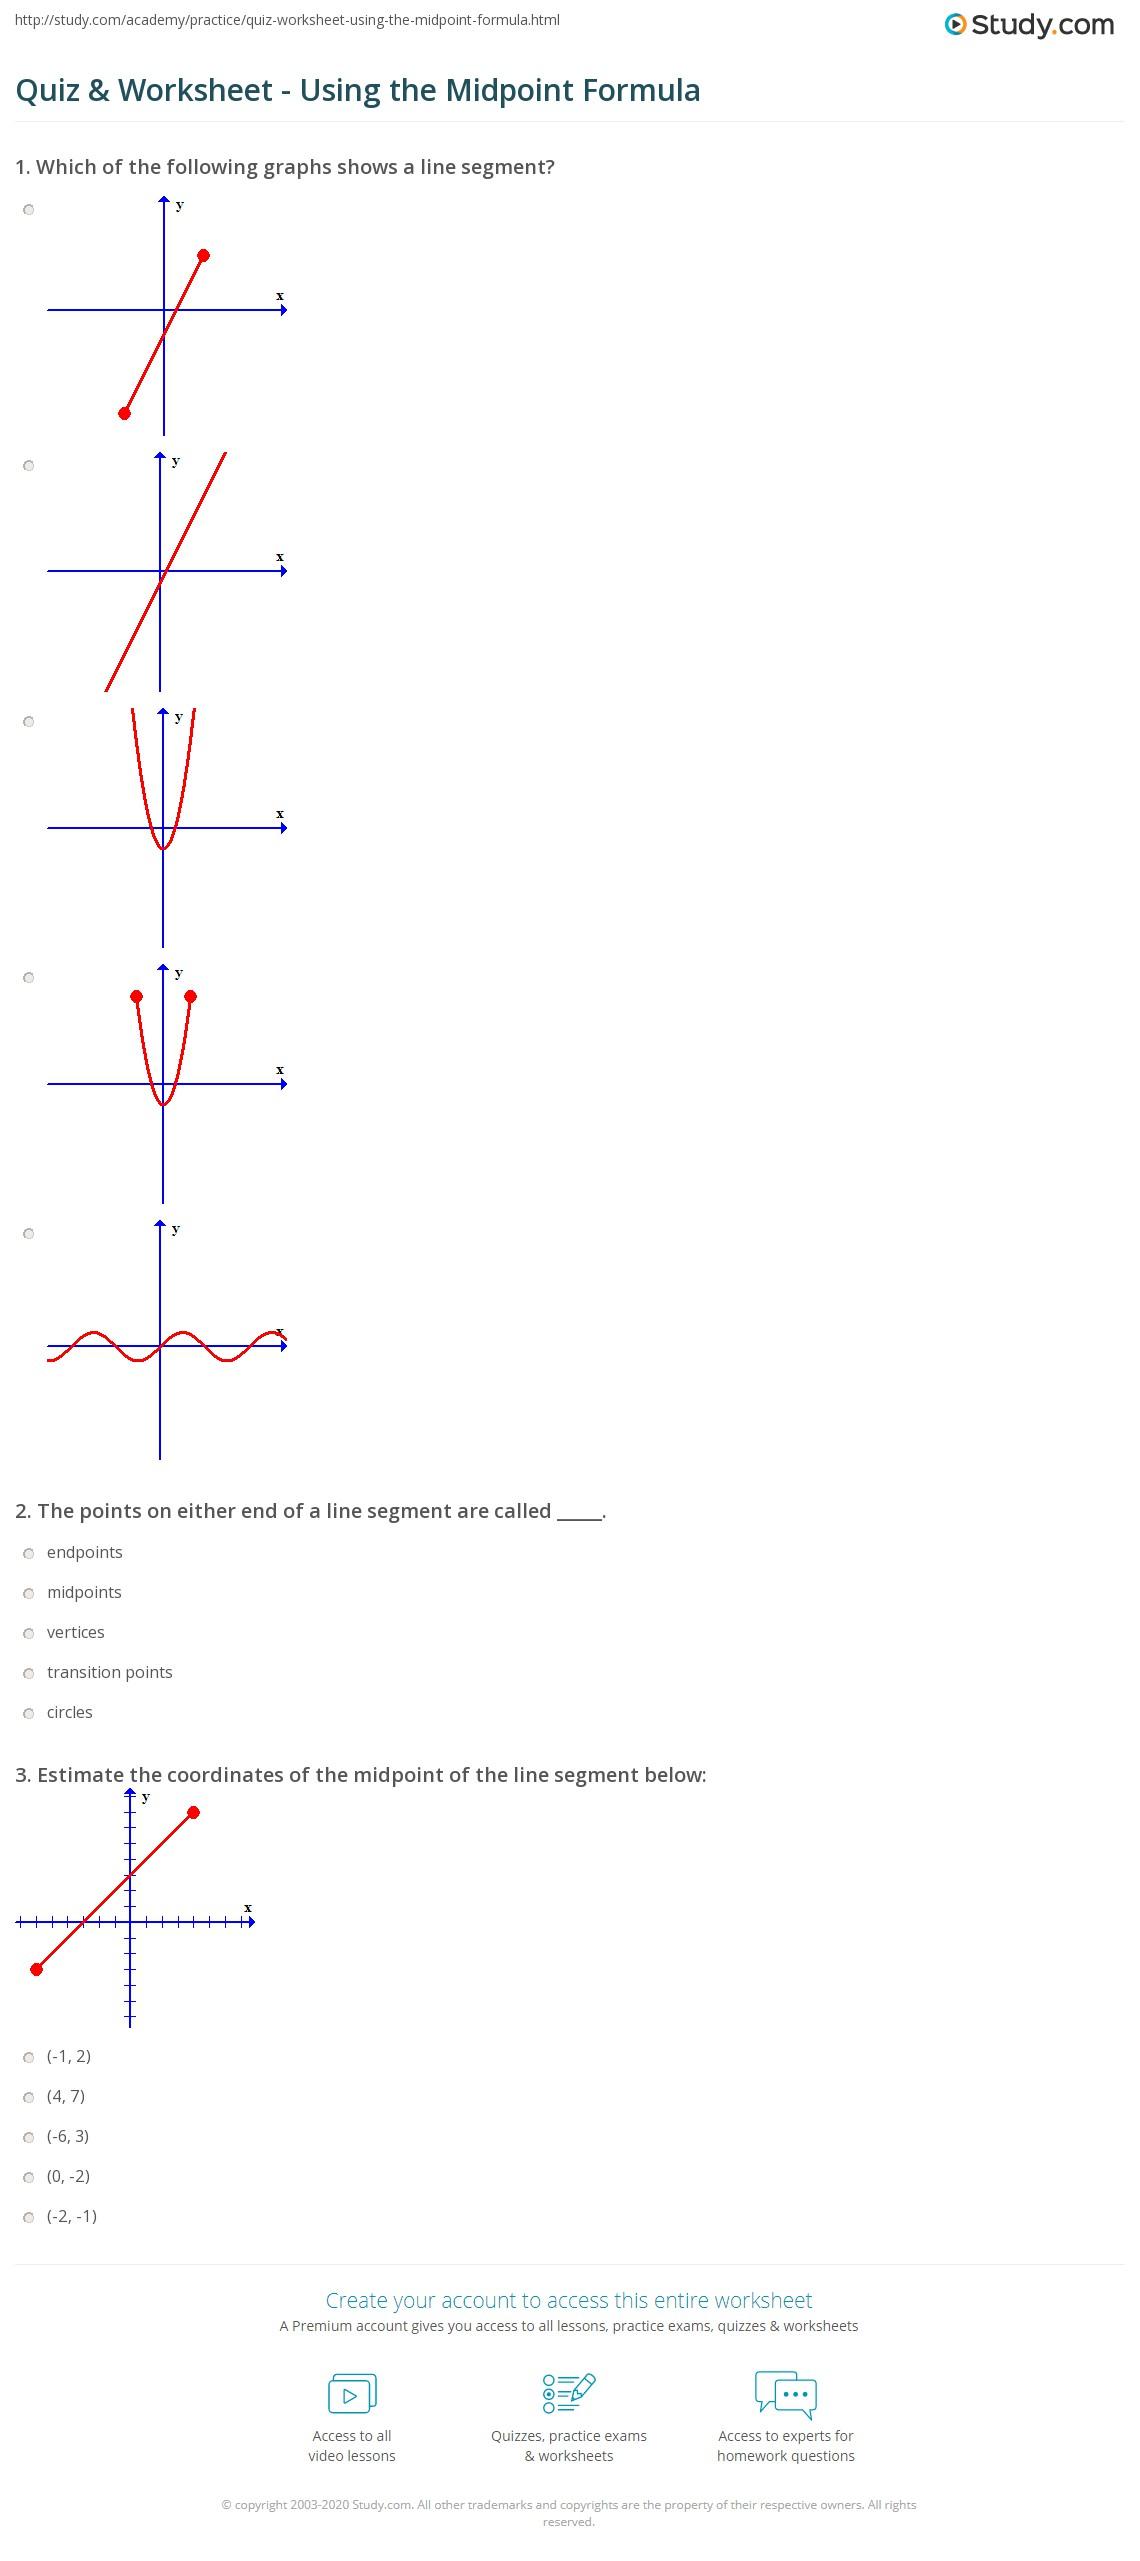 : Hypothesis Testing Worksheet, Using Midpoint Formula Worksheet ...